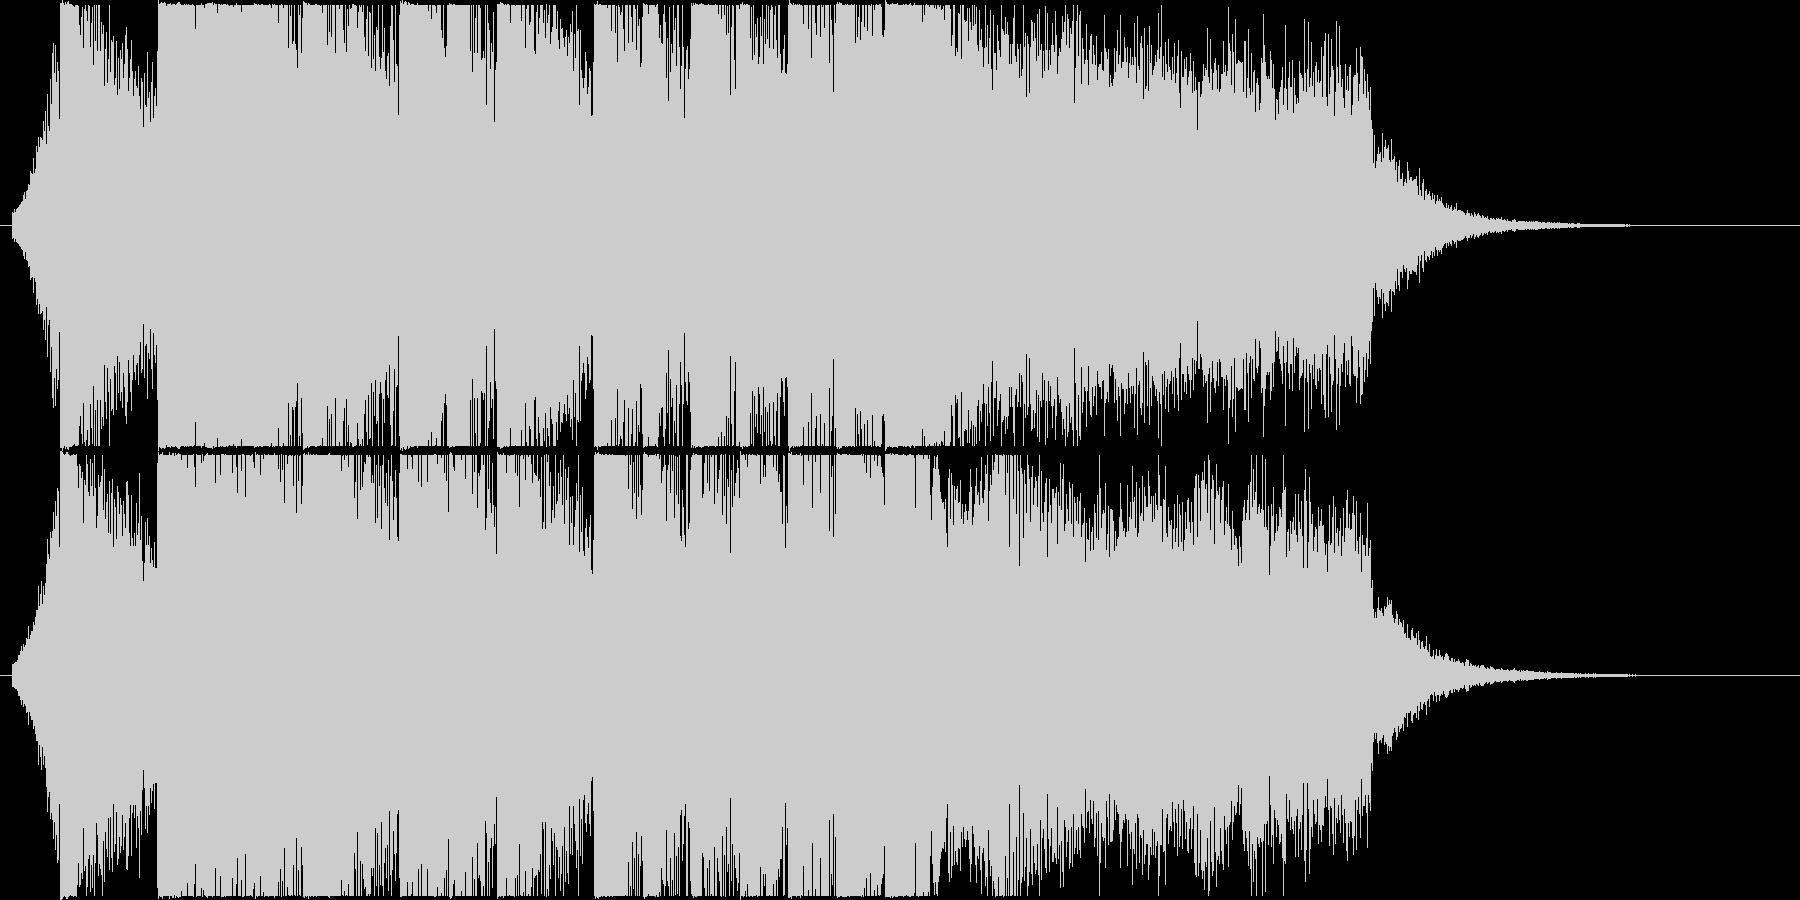 Refreshing EDM jingle / CM's unreproduced waveform